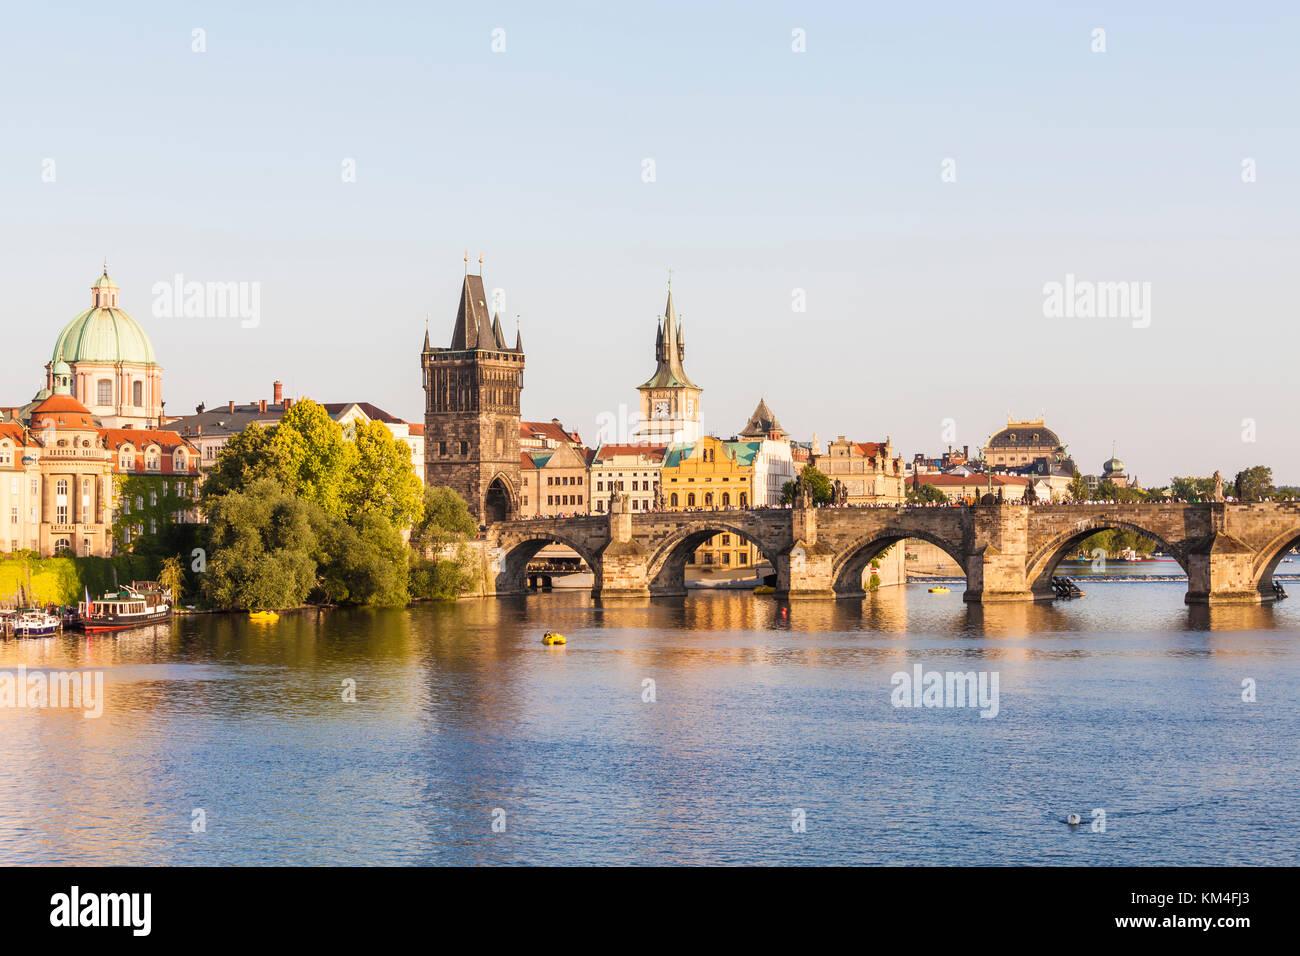 Tschechien, Prag, Altstadt, Moldau, Karlsbrücke, Altstädter Brückenturm - Stock Image